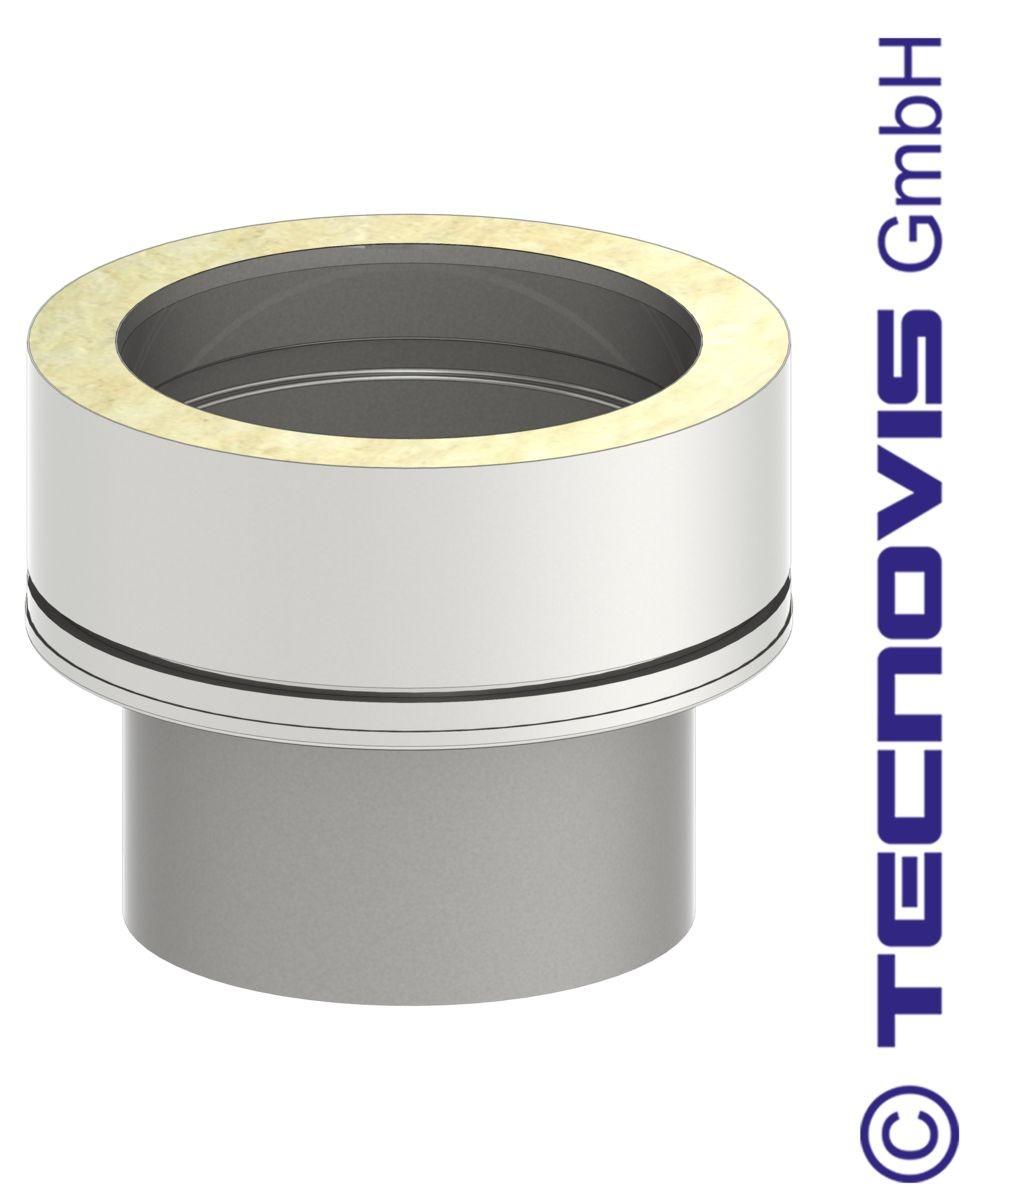 Adaptateur INOX simple - double paroi 250 mm